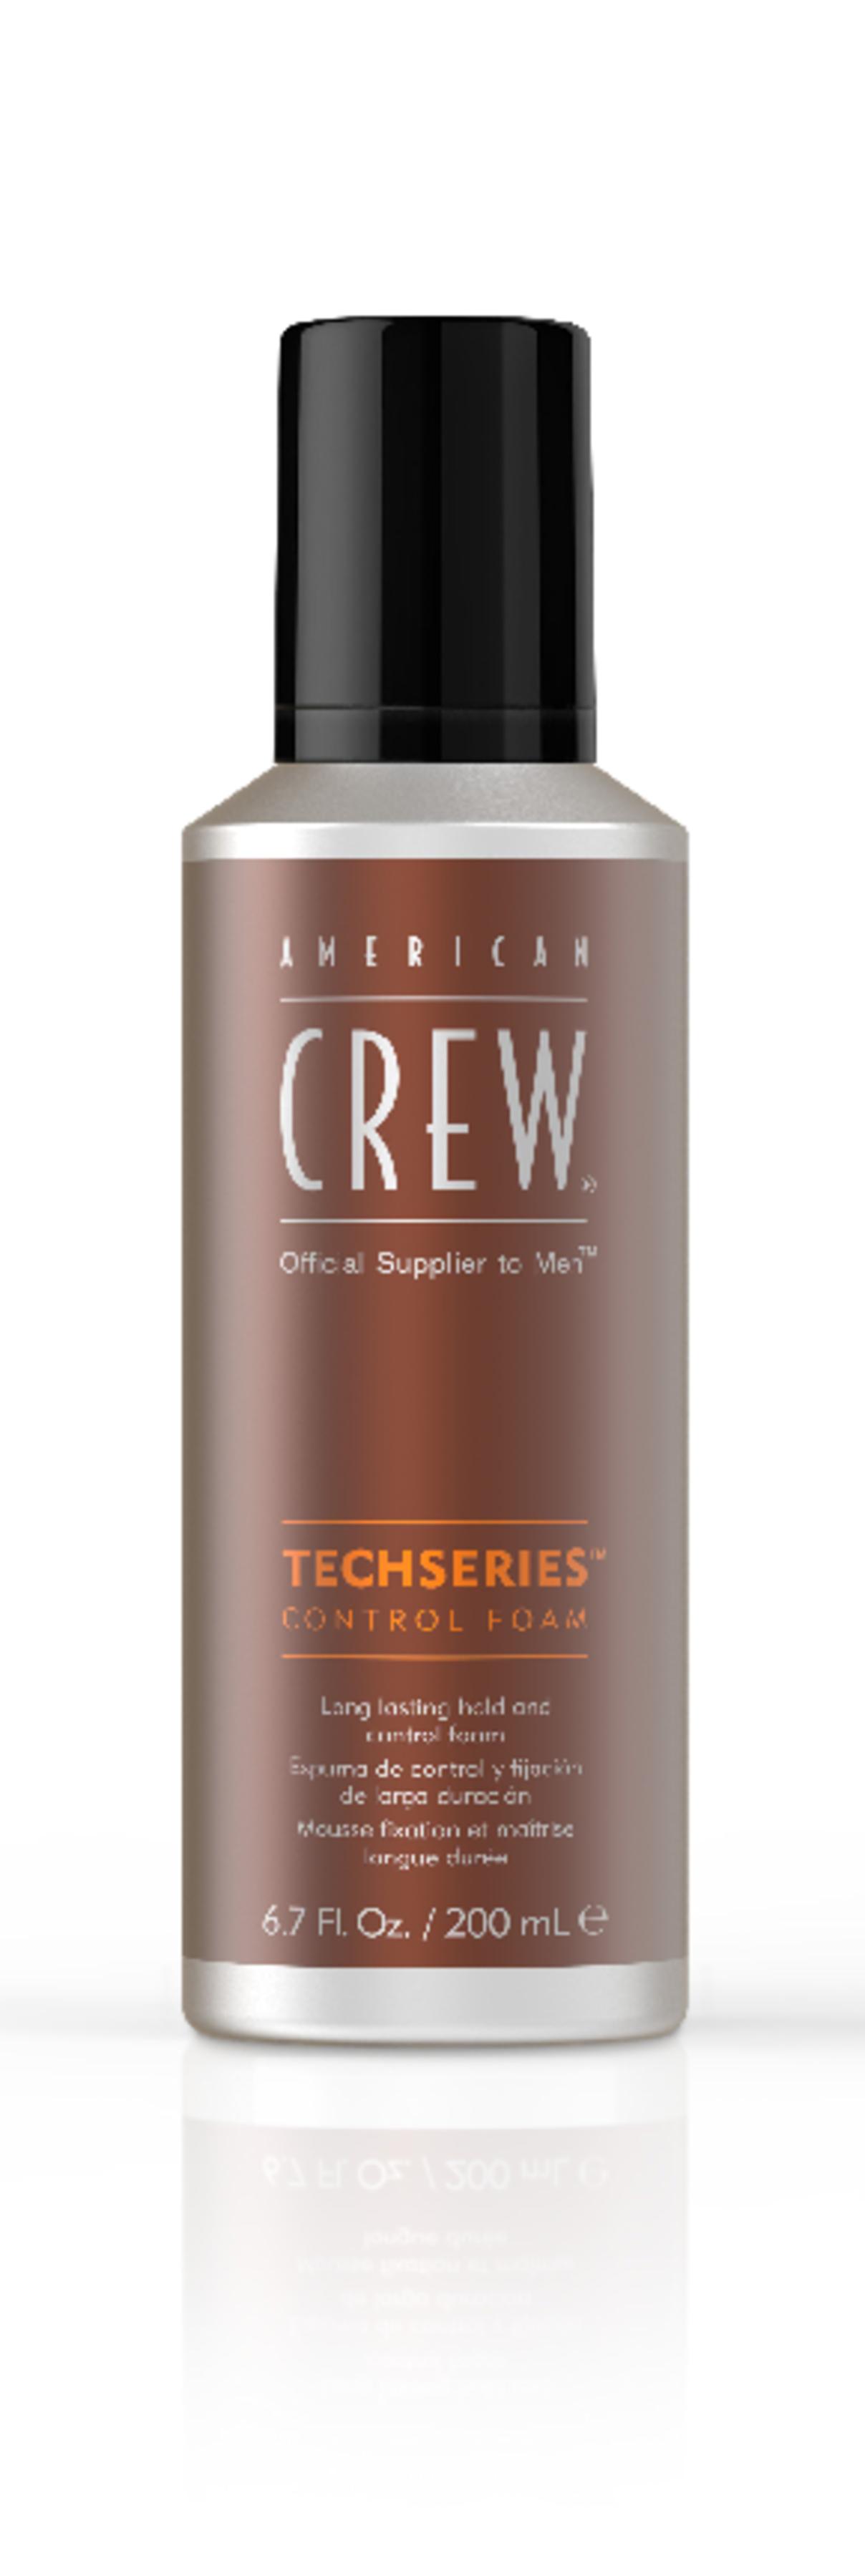 American Crew - Techseries Control Foam 200 ml